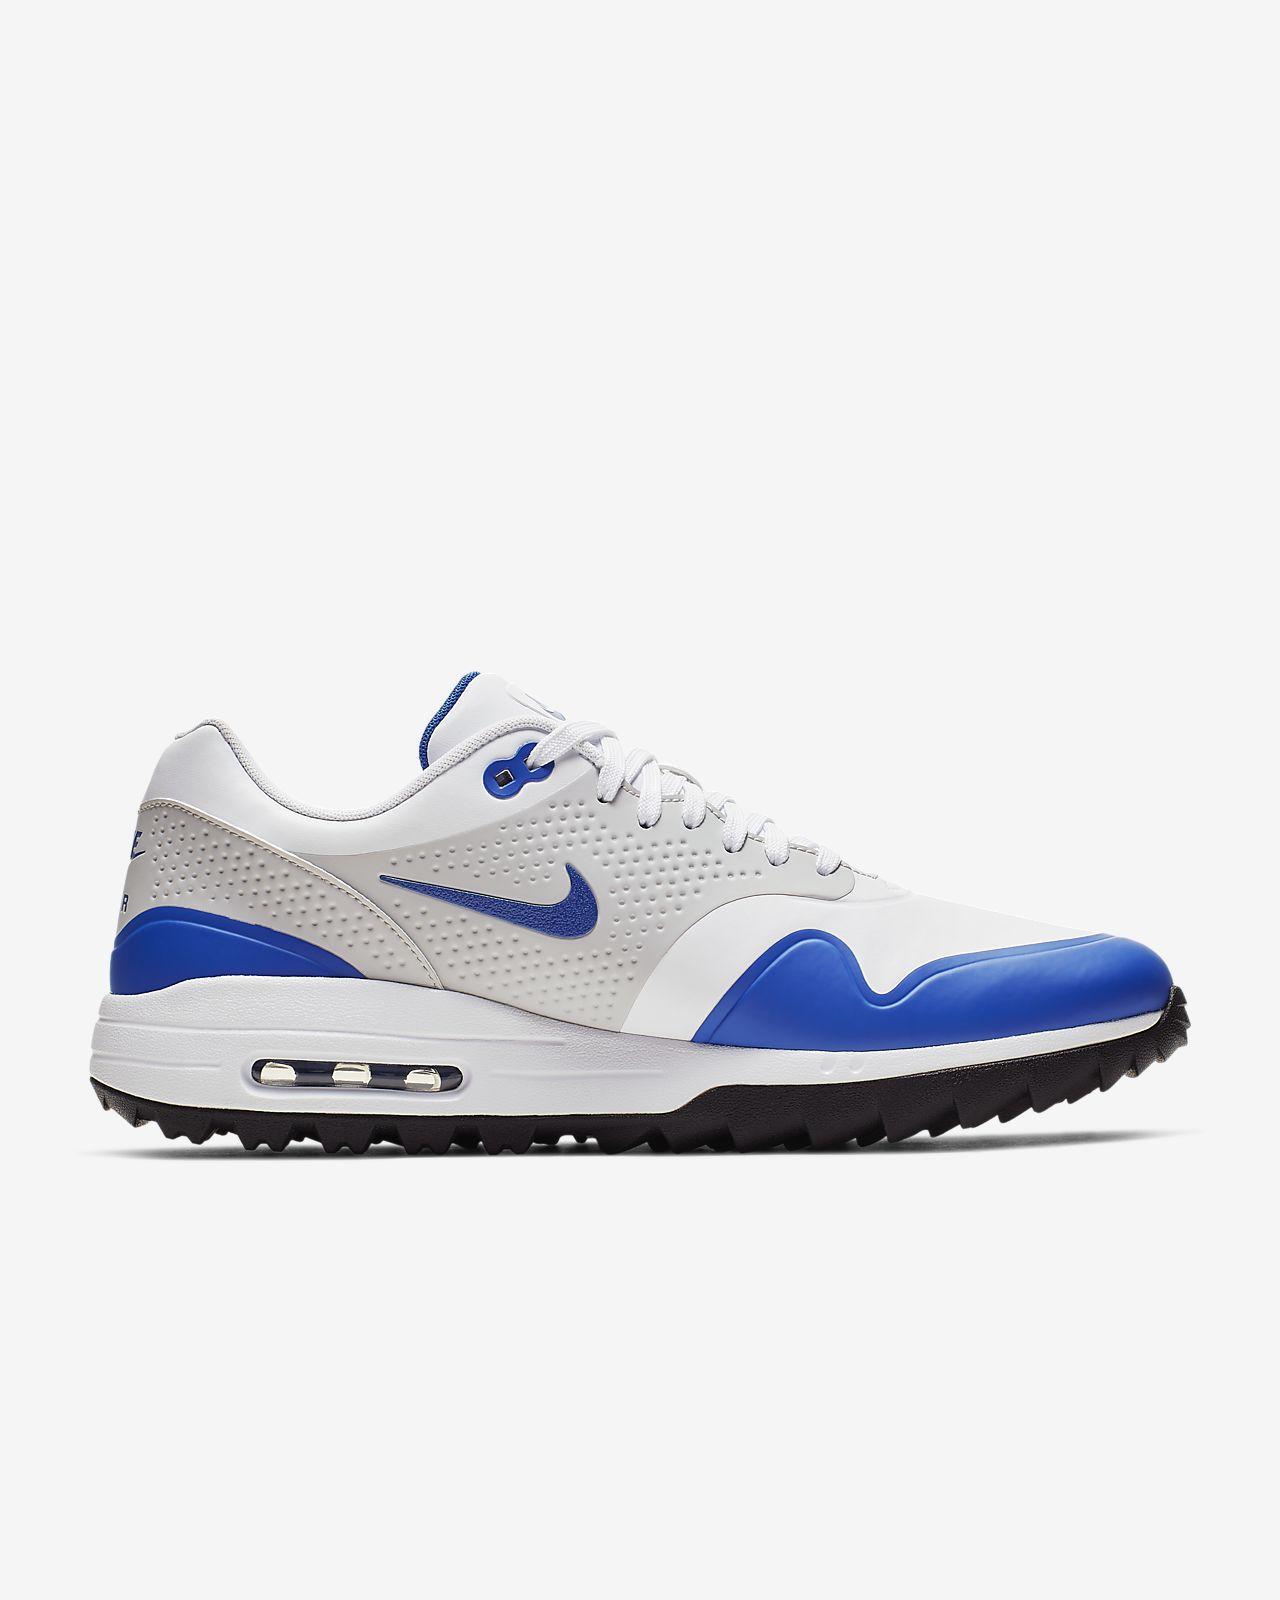 schuheonline.1450U Nike Air Max 87 Schuhe Damen Hellblau Grün CN8164